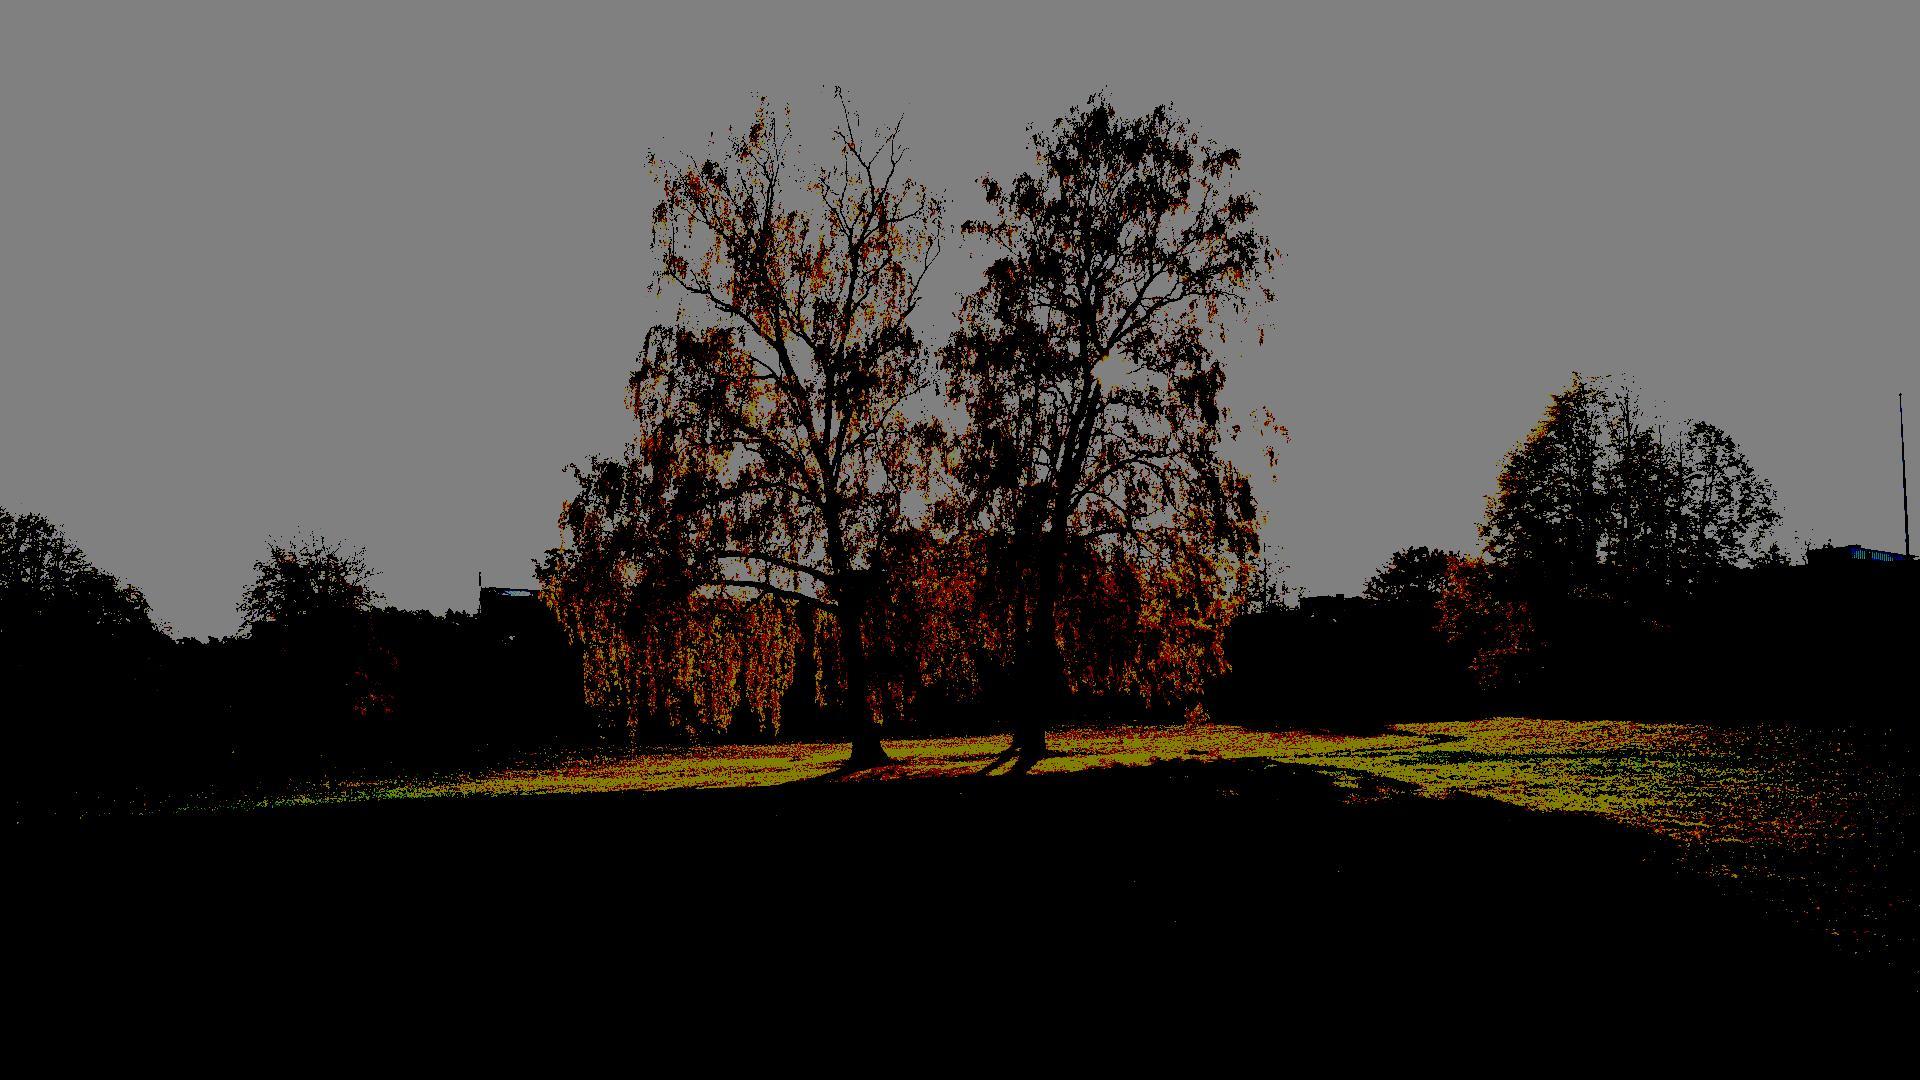 Frescati foto Magnus Norden